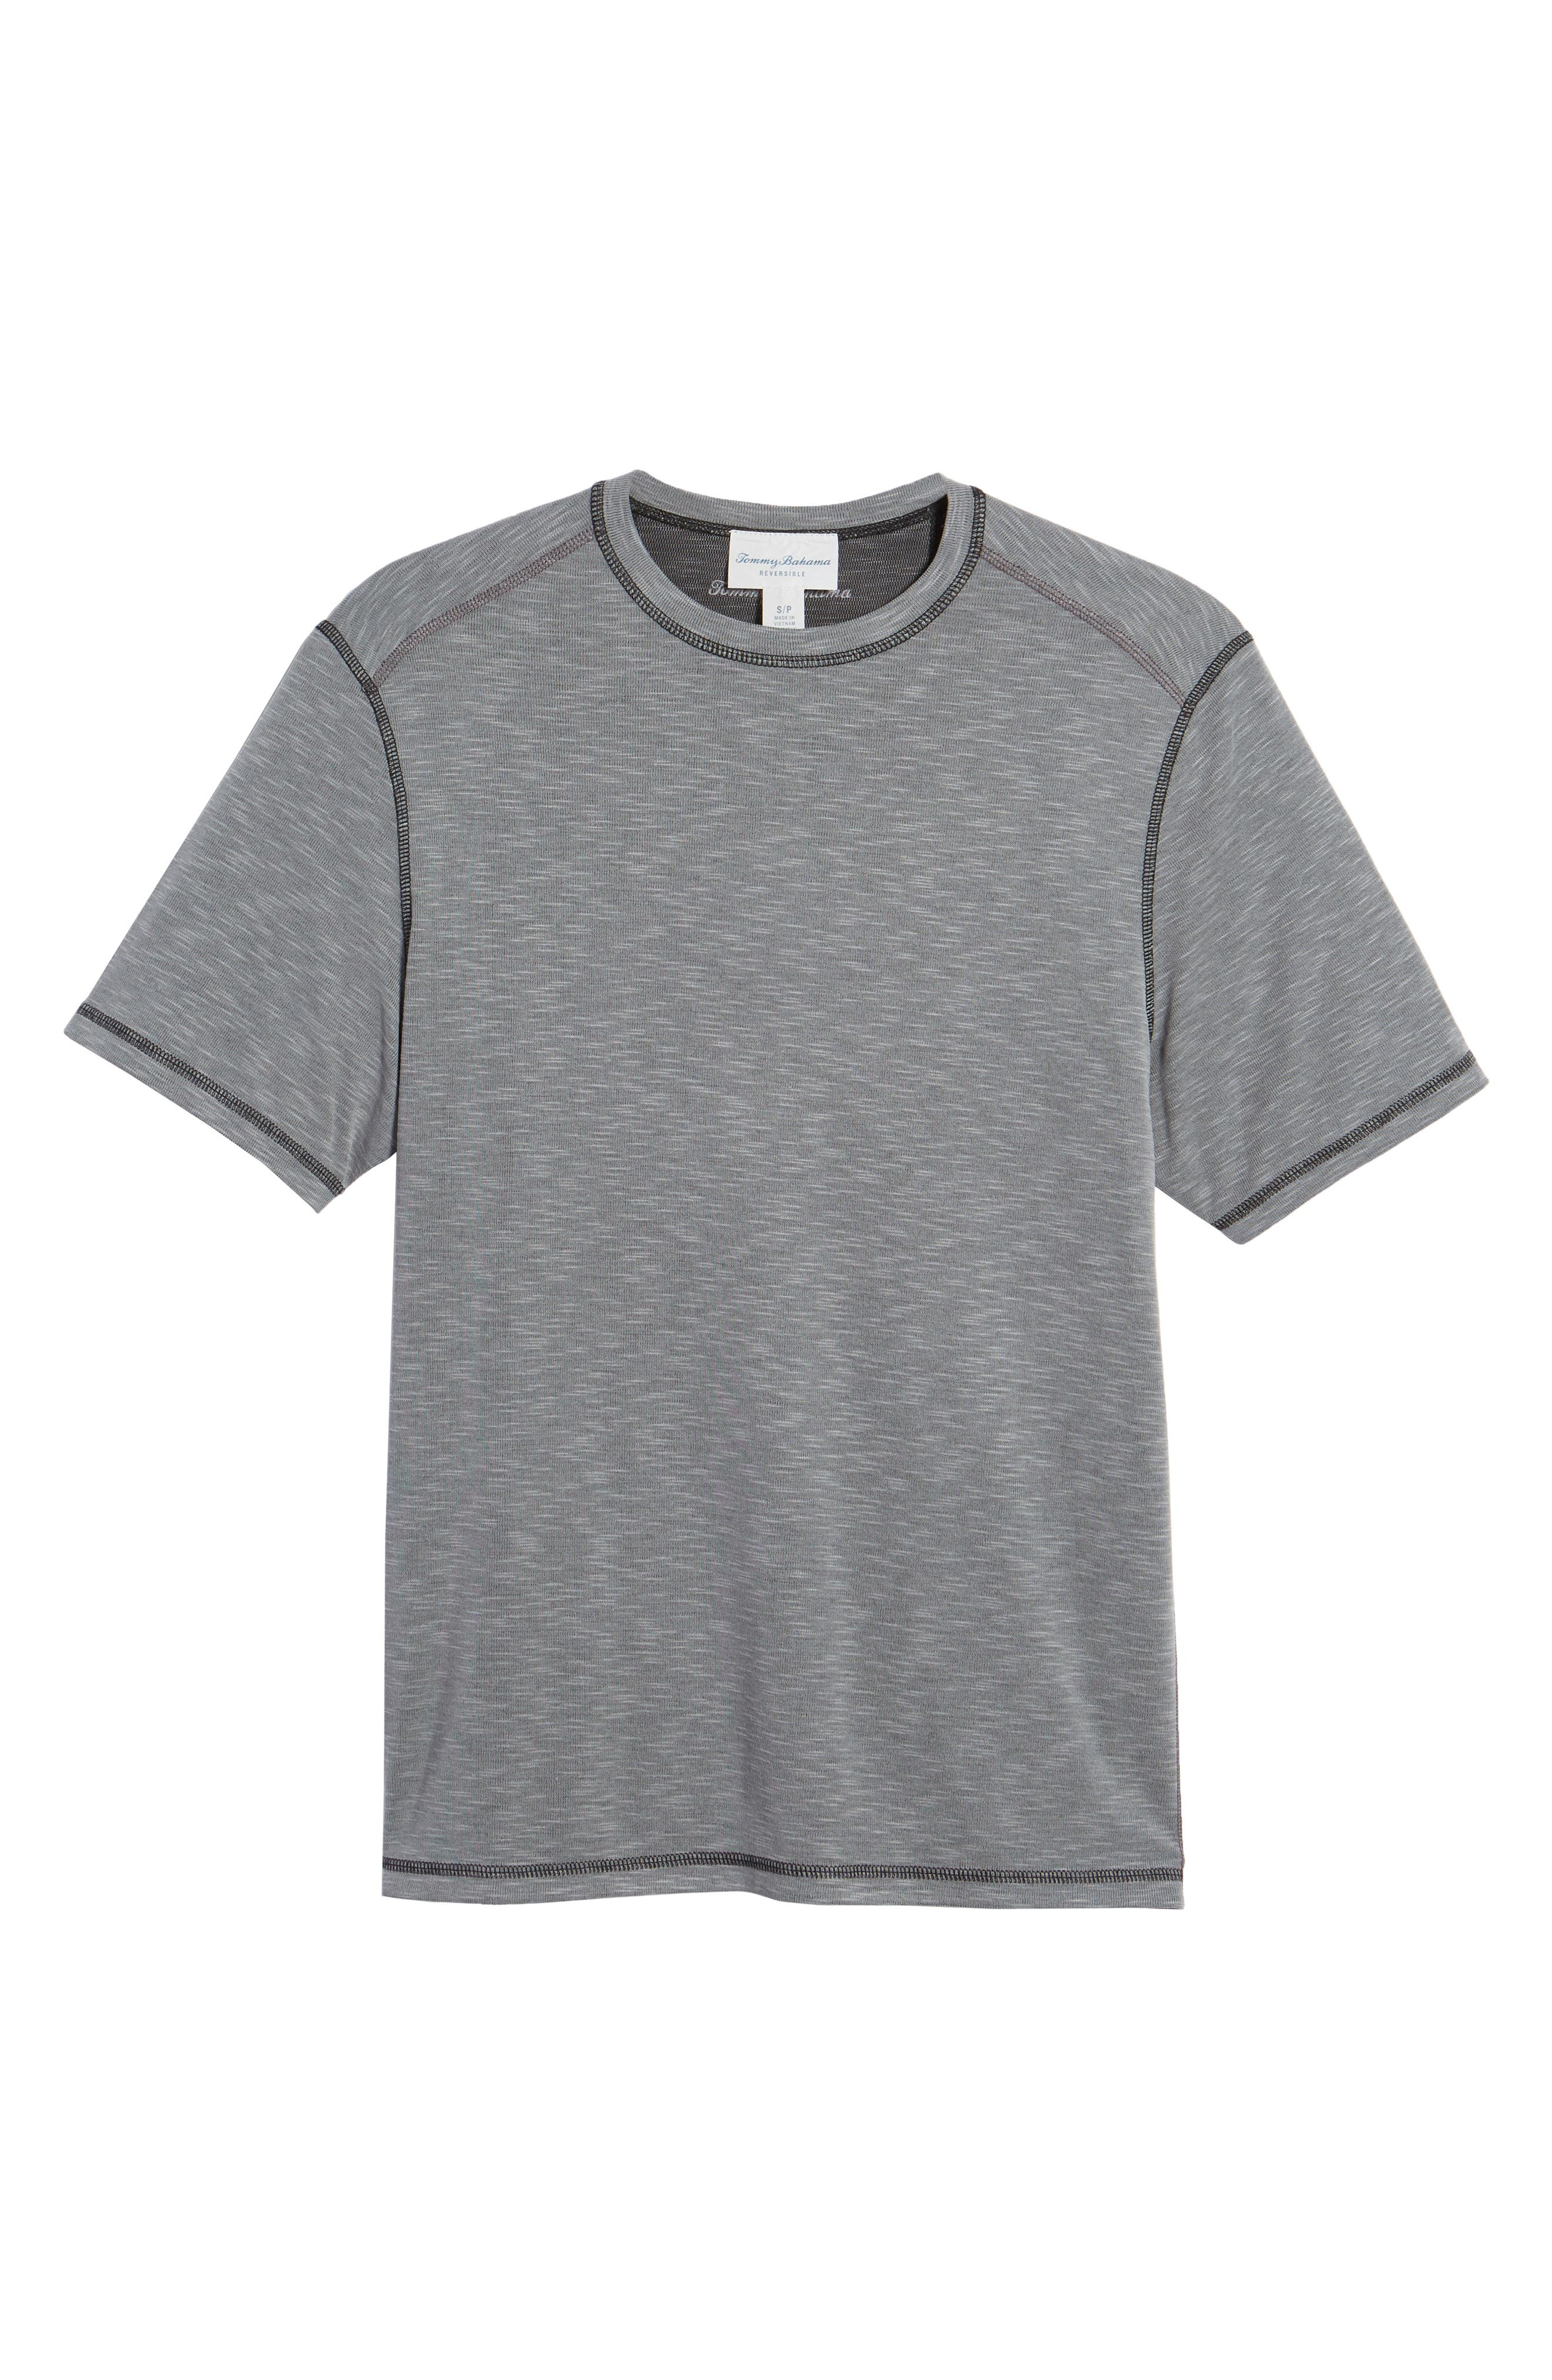 Flip Tide T-Shirt,                             Alternate thumbnail 6, color,                             COAL